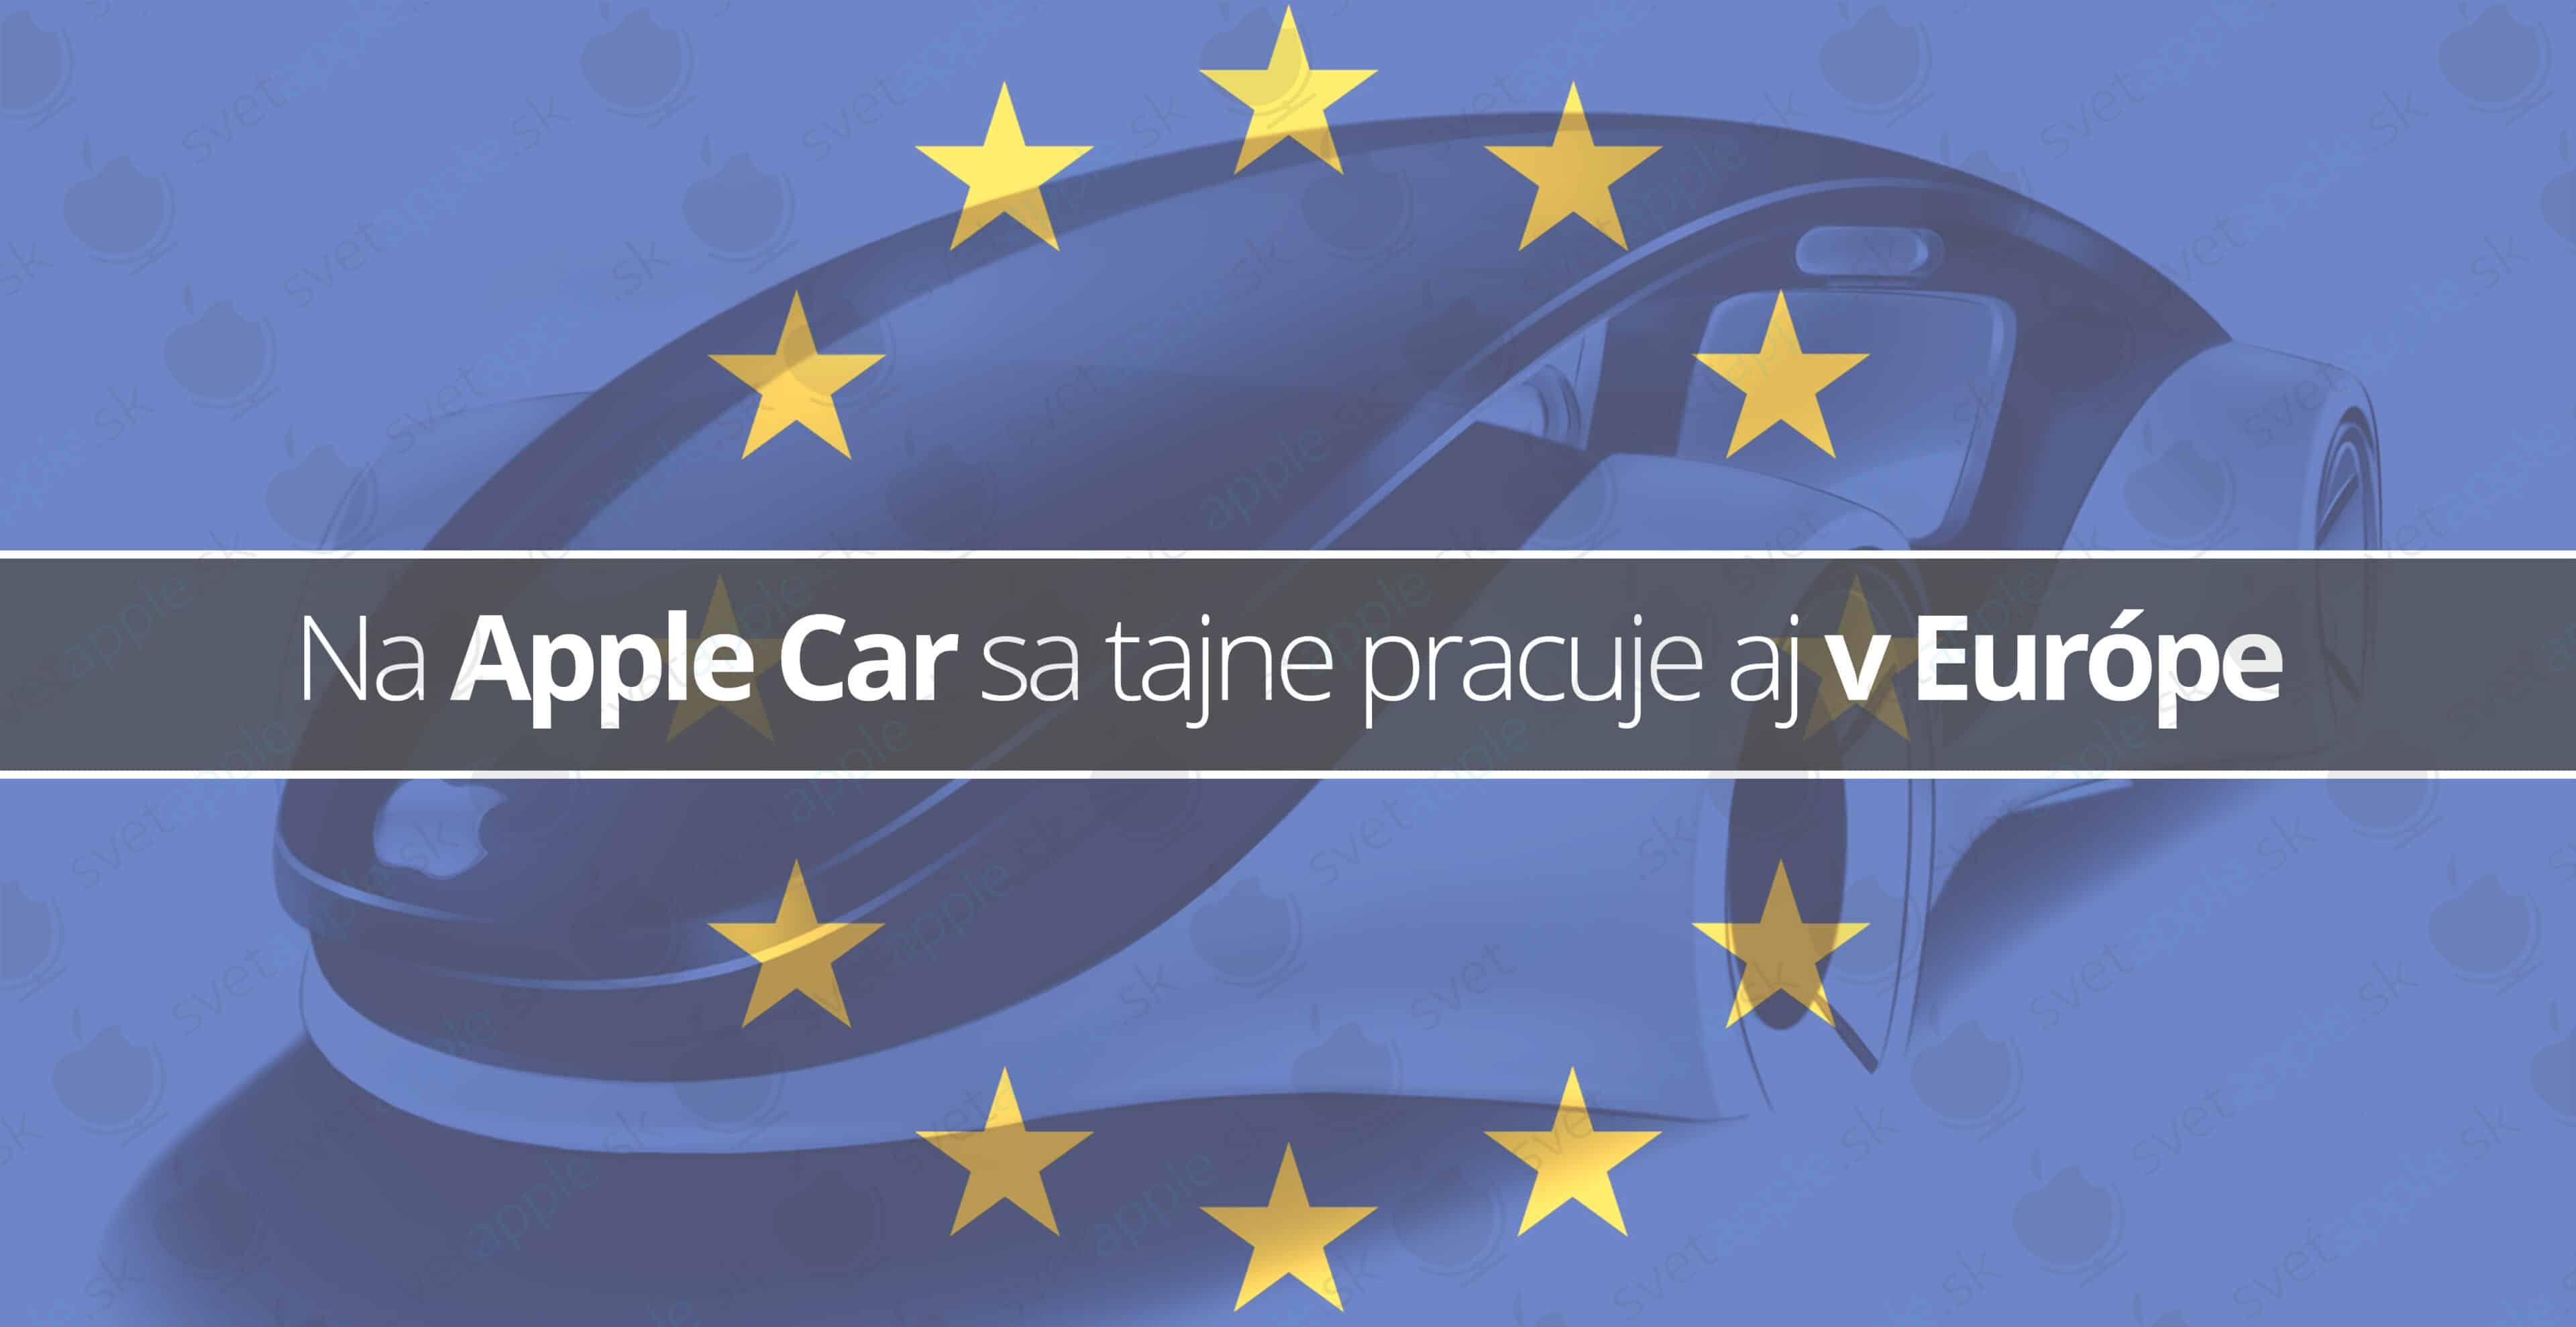 apple-car-europa---titulná-fotografia---SvetApple